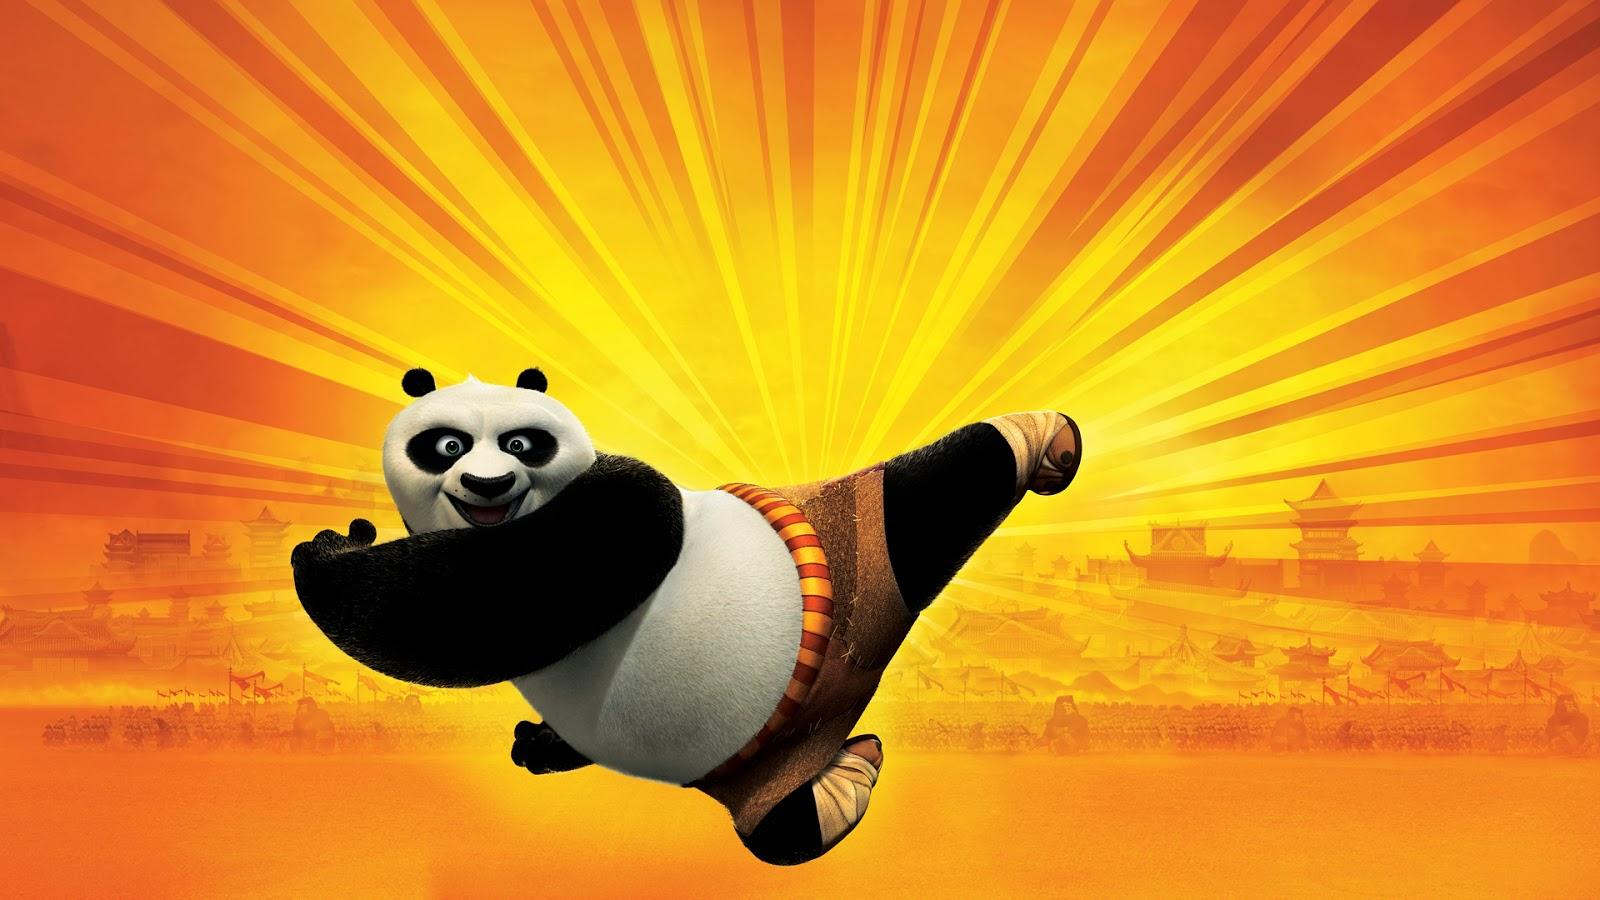 kung fu panda hd wallpapers - beautiful desktop wallpapers 2014